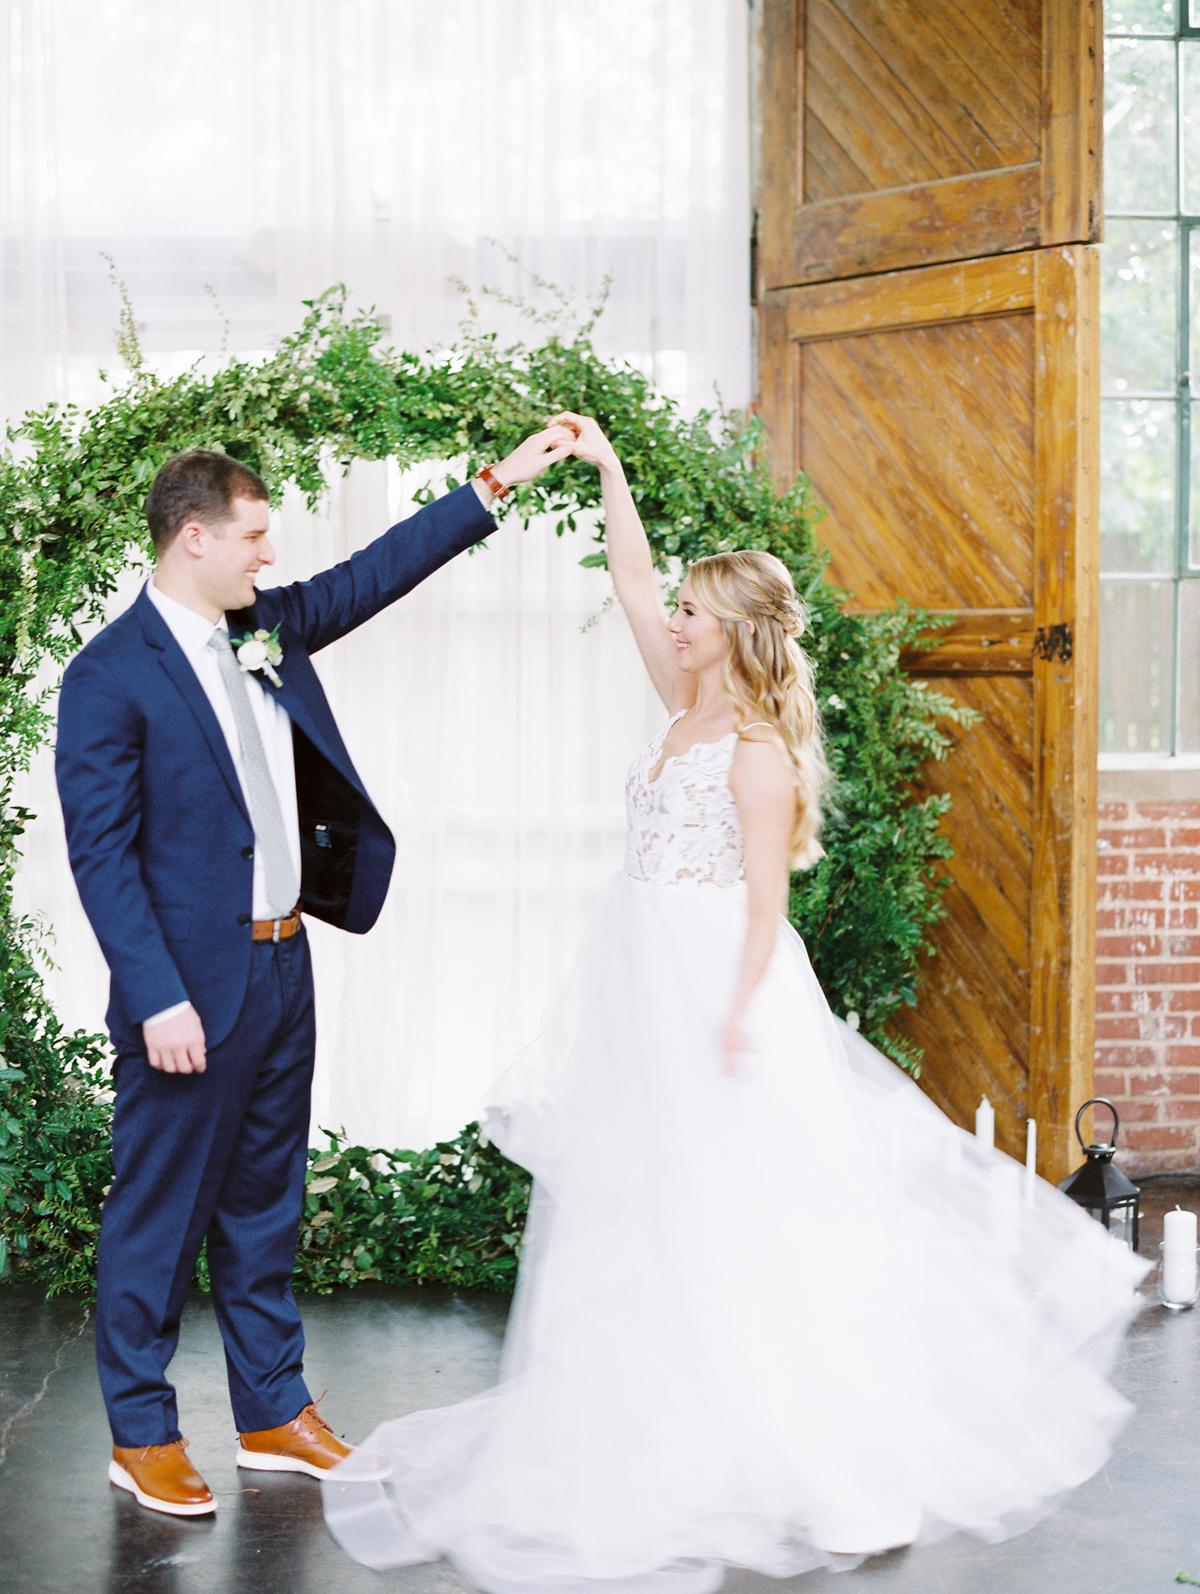 Foundry-At-Puritan-Mill-wedding-photos-venue-atlanta-fine-art-film-photographer19.JPG